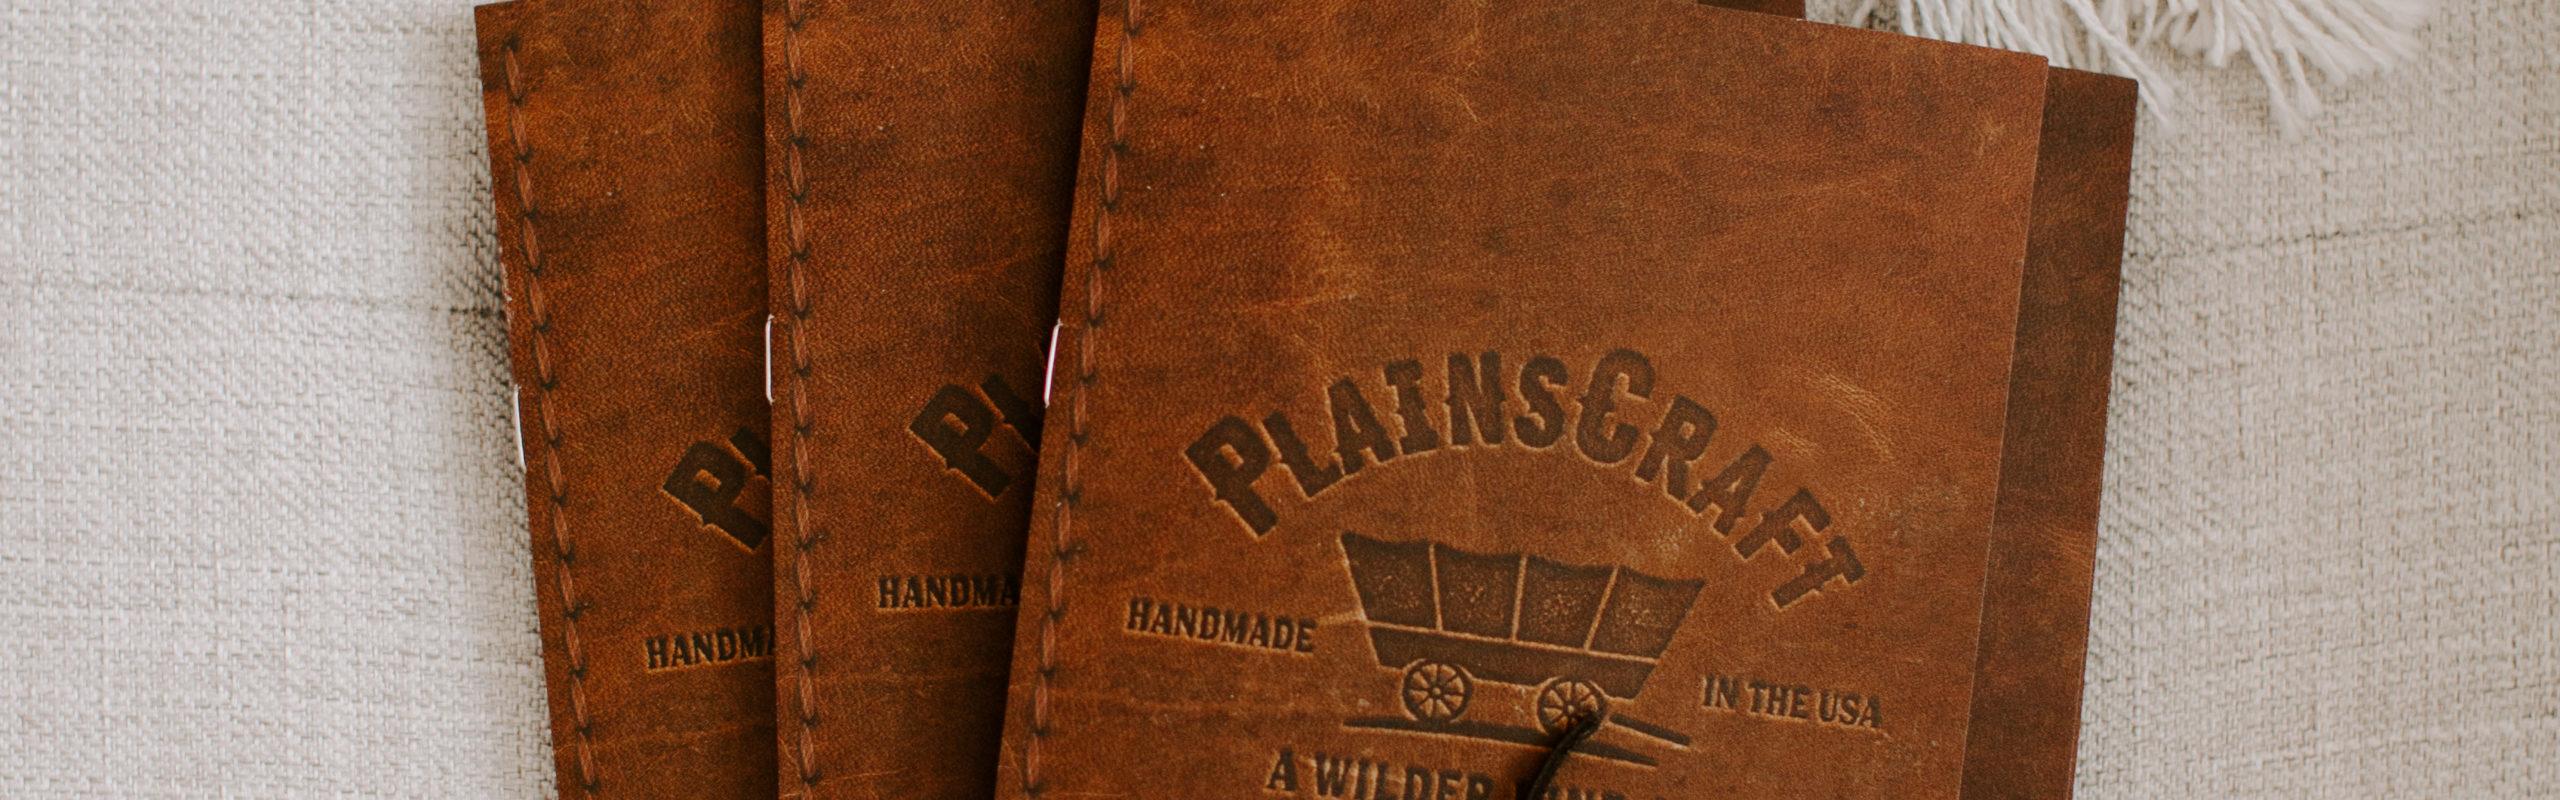 PlainsCraft Covered Wagons brochure